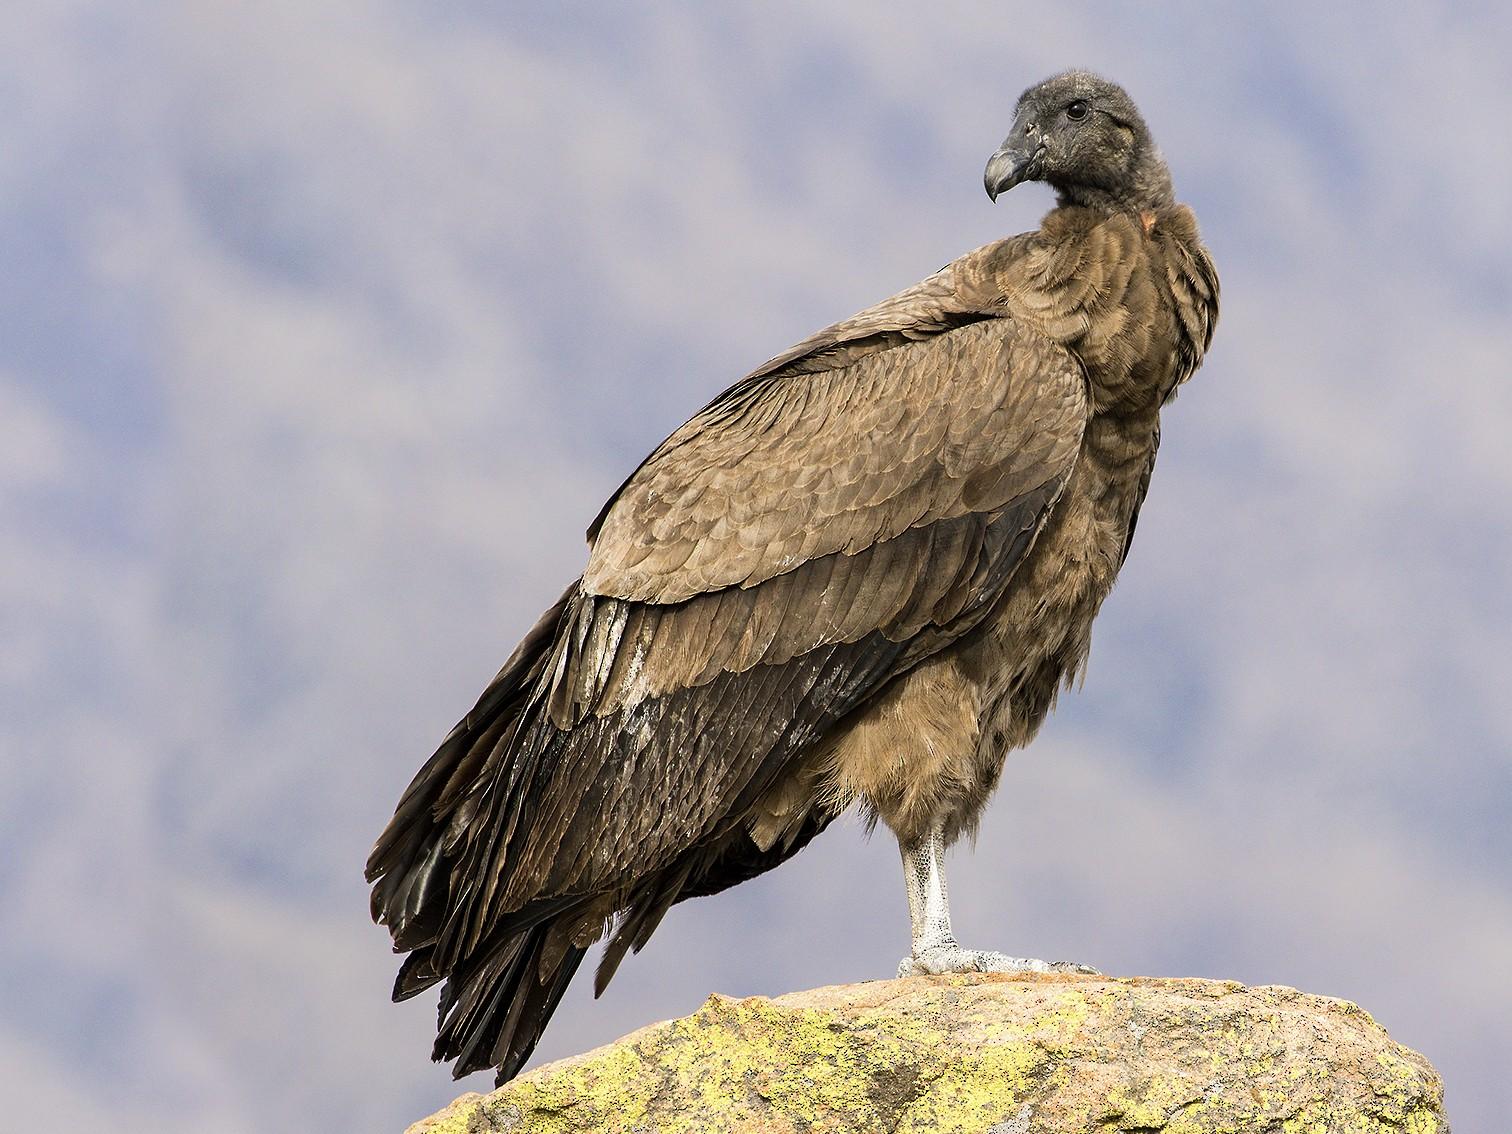 Andean Condor - Evangelina Indelicato